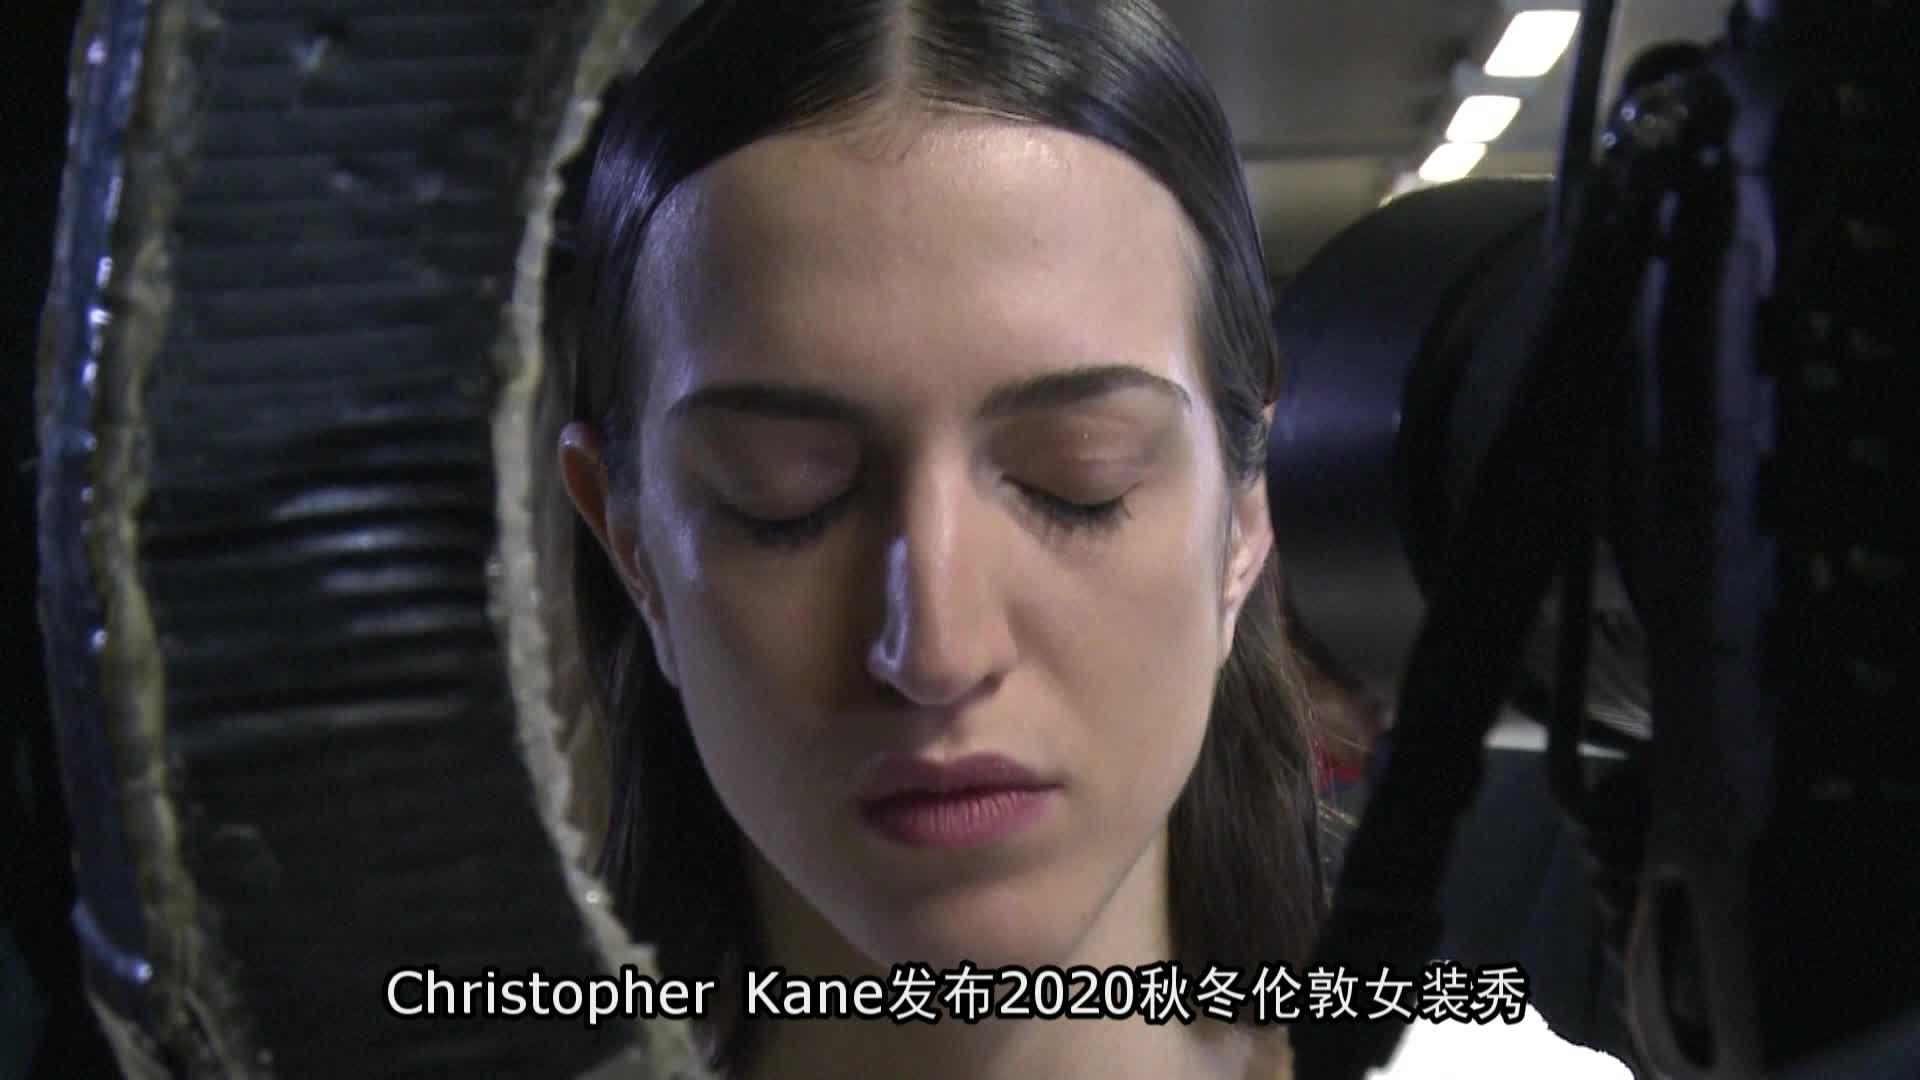 Christopher Kane 2020秋冬伦敦女装秀访谈